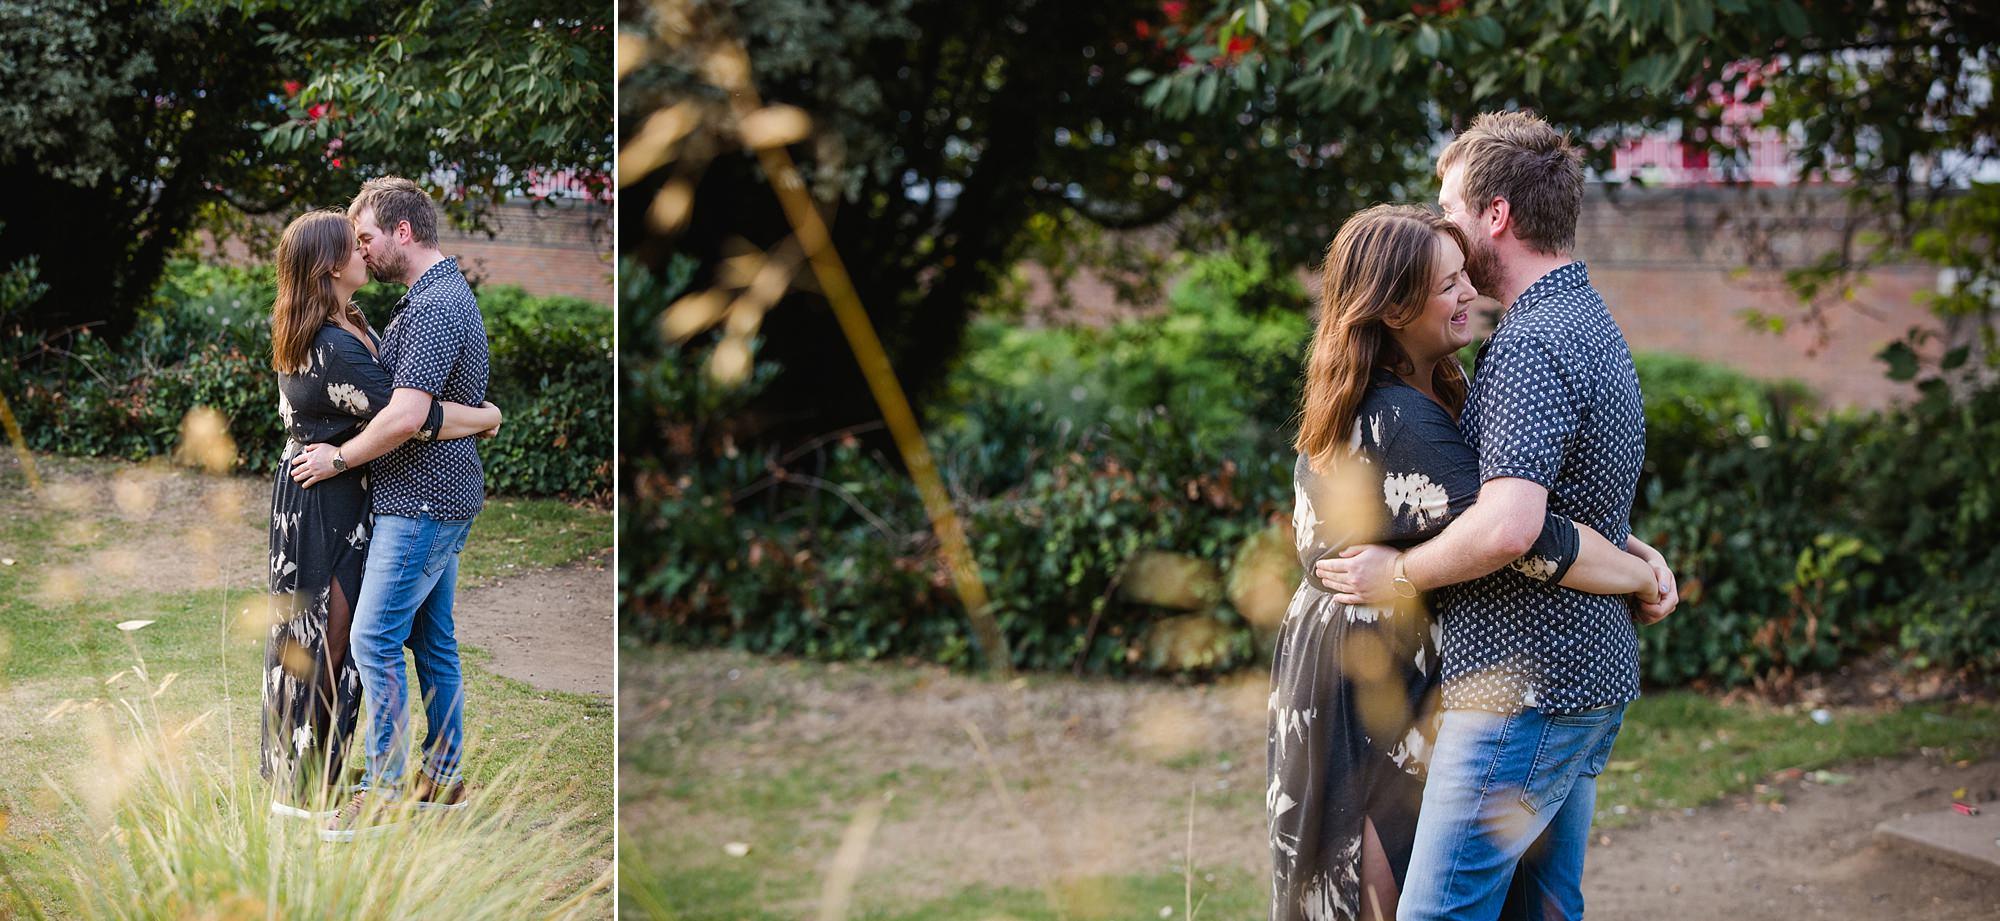 Croydon engagement photography - portrait of couple hugging